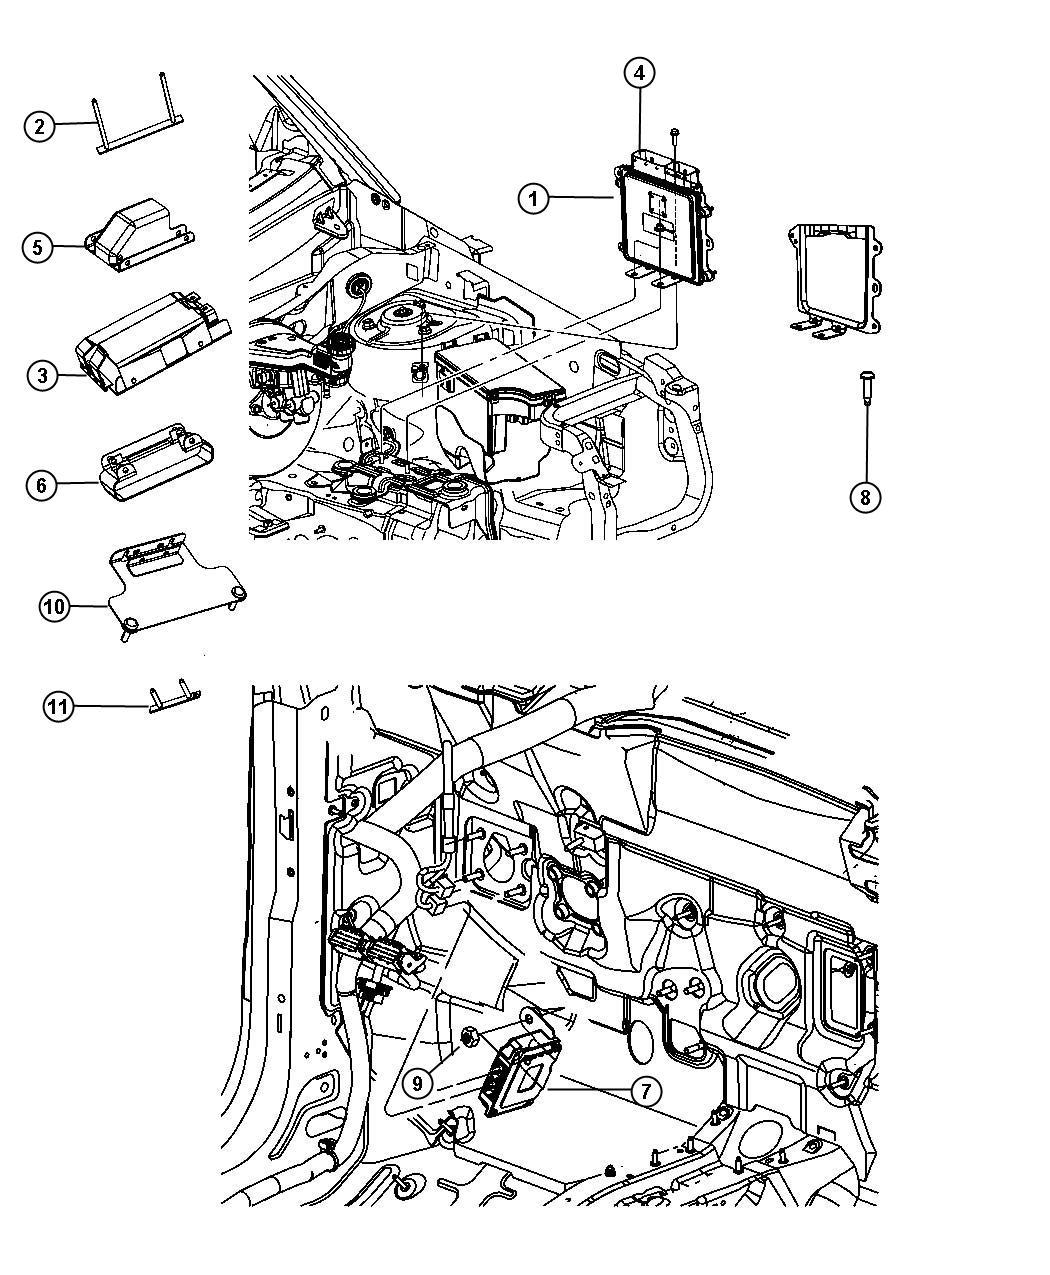 2012 Jeep Patriot Module. Powertrain control. Generic